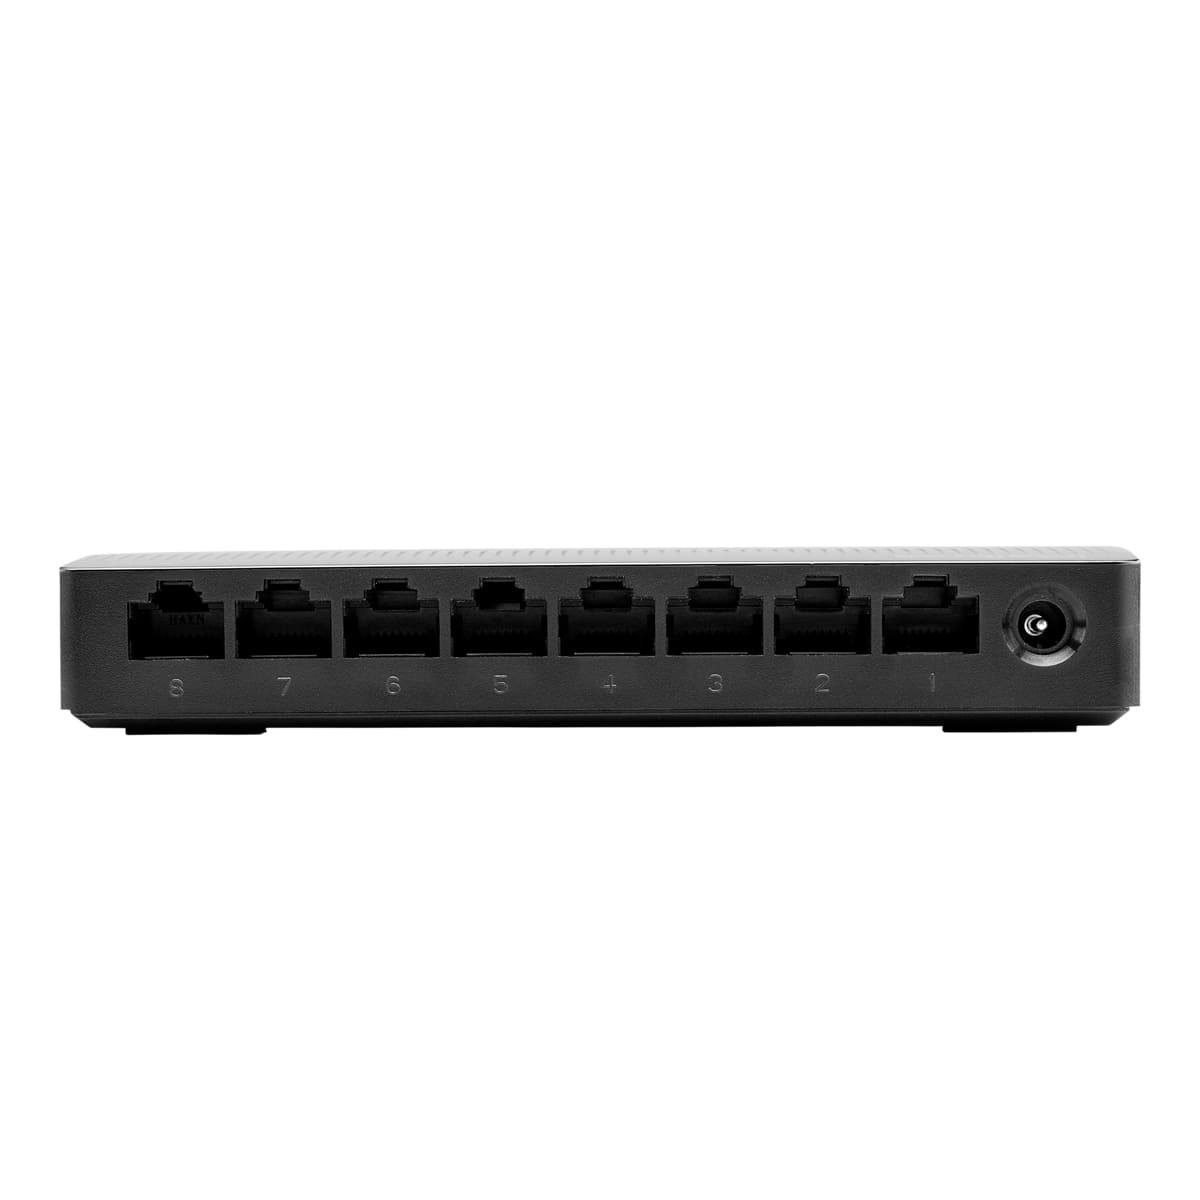 Switch 8 Portas Intelbras SG 800 Q+